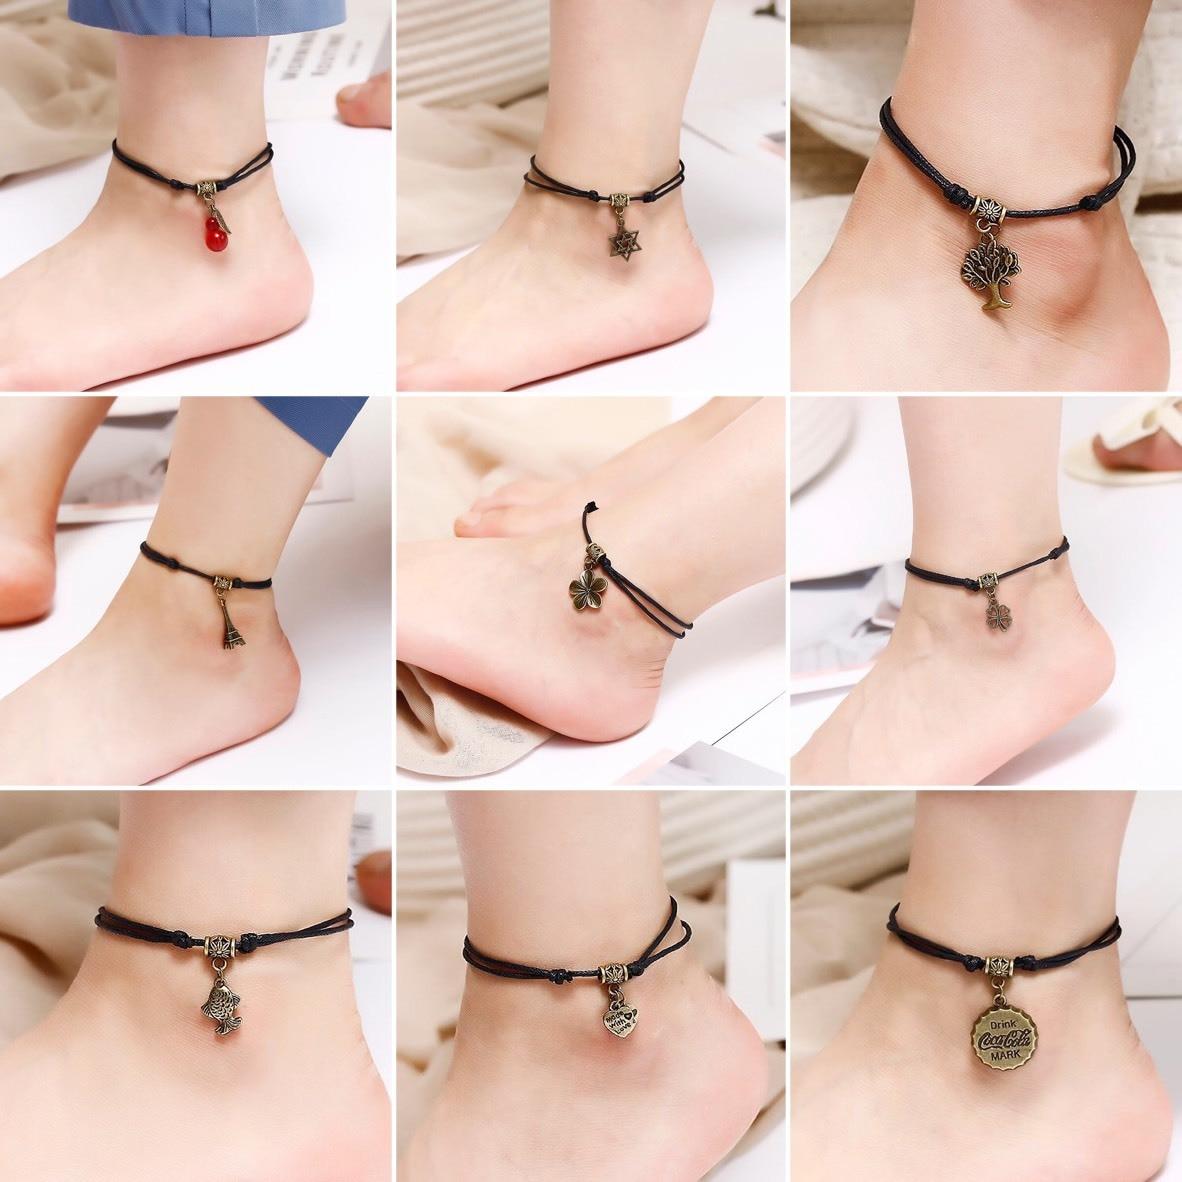 Bohemia Butterfly Heart Tree Tower Pendant Ankle for Women Black Rope Bracelets on Leg Choker Ankles Sandal China Jewelry Gift